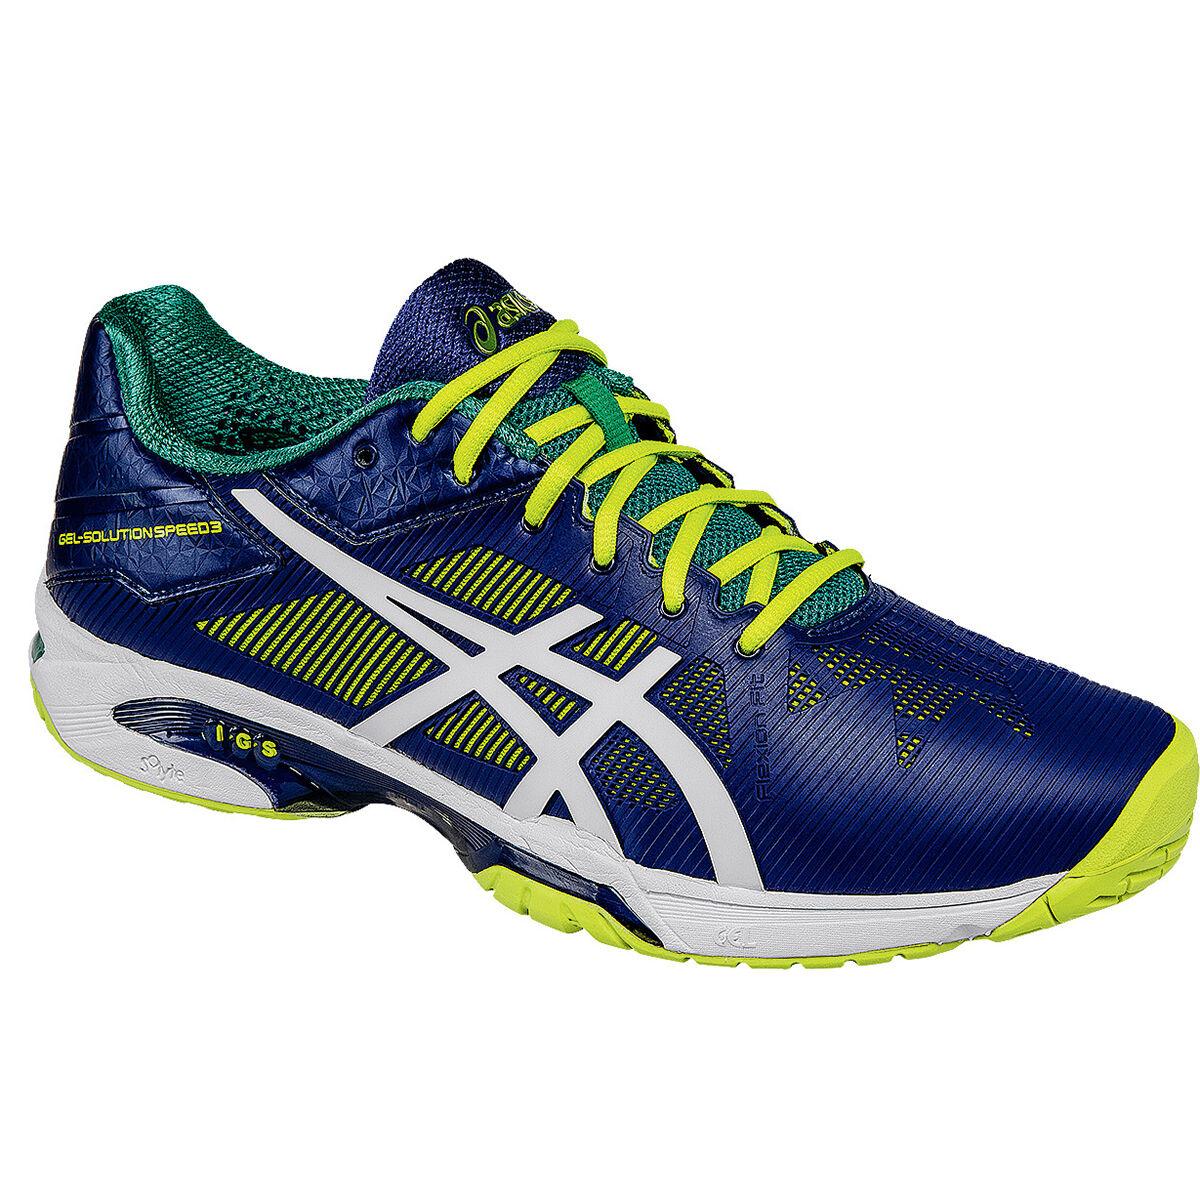 Asics Gel-Solution Speed 3 Tennis Shoe